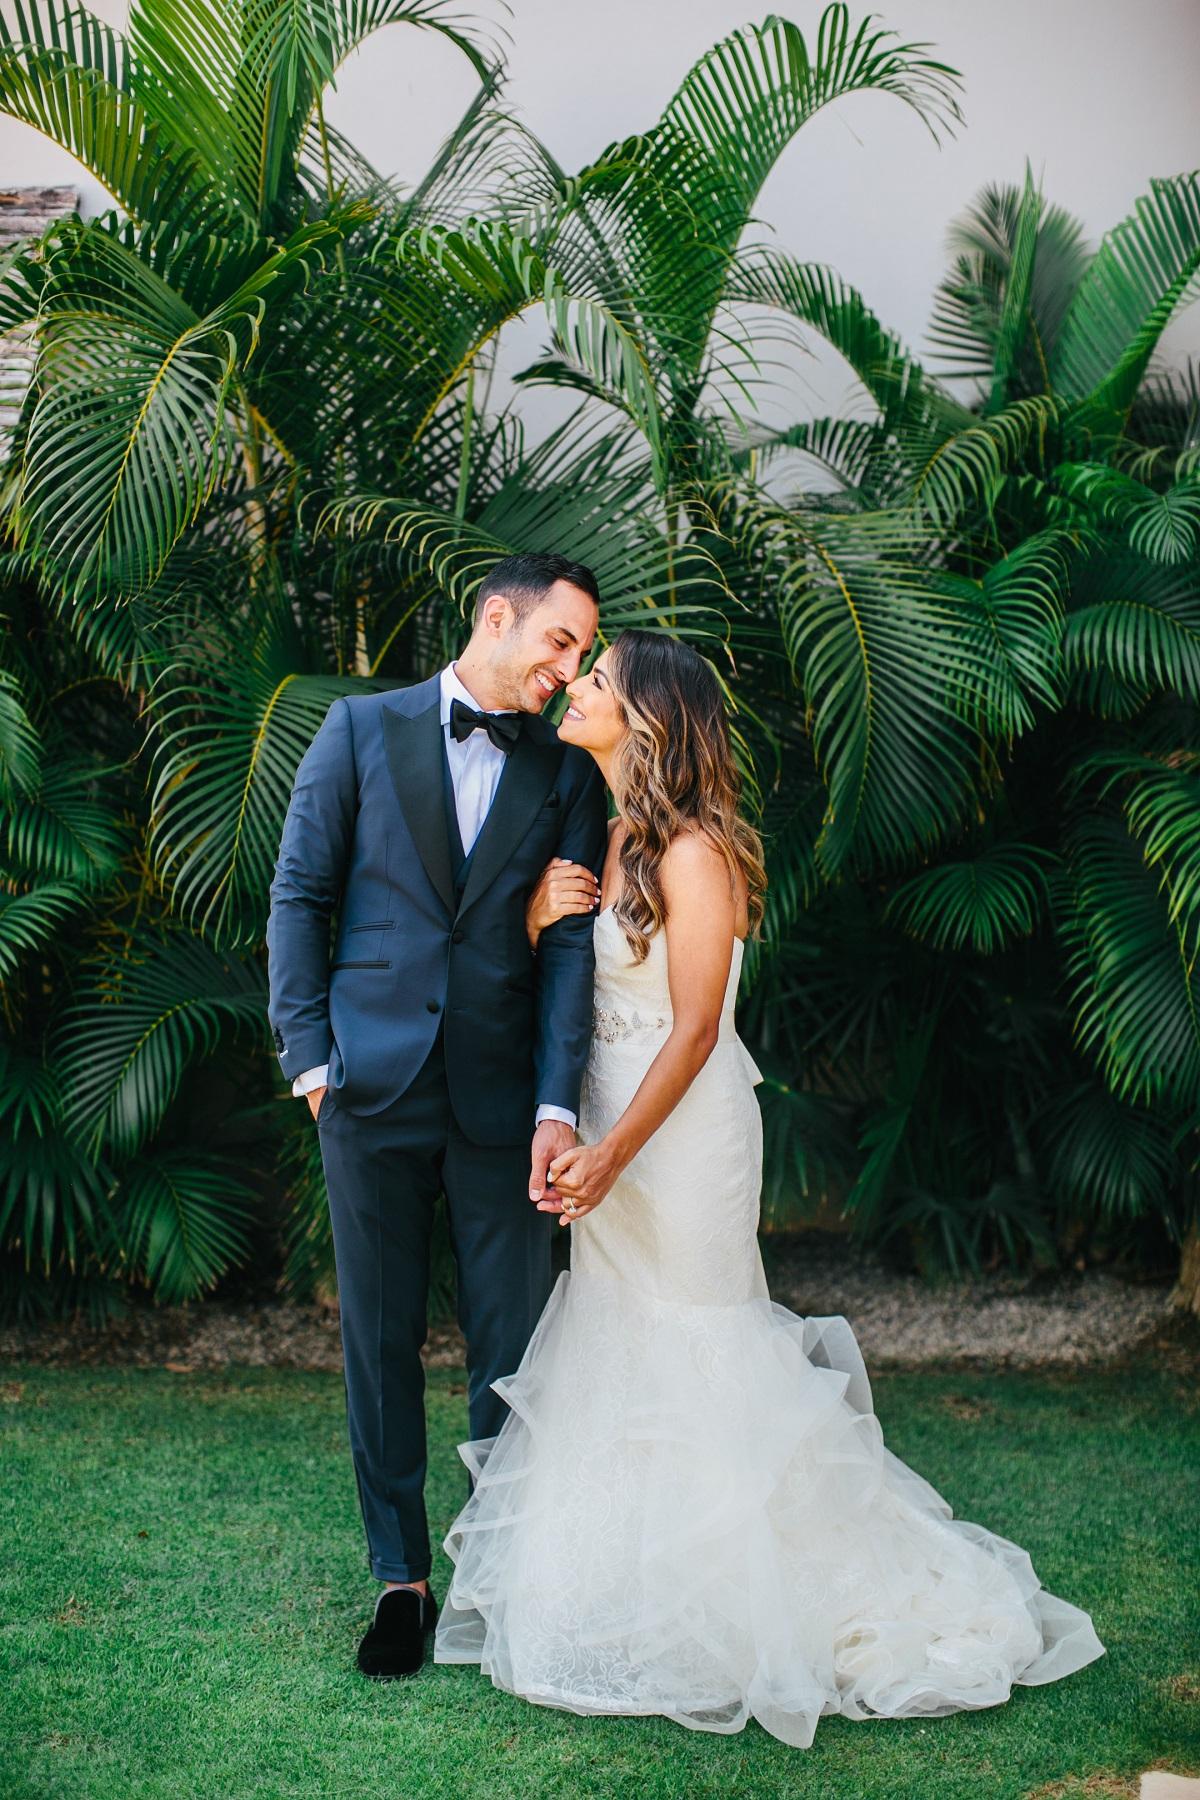 Nusha & Marcel's Esperanza Wedding On Carats